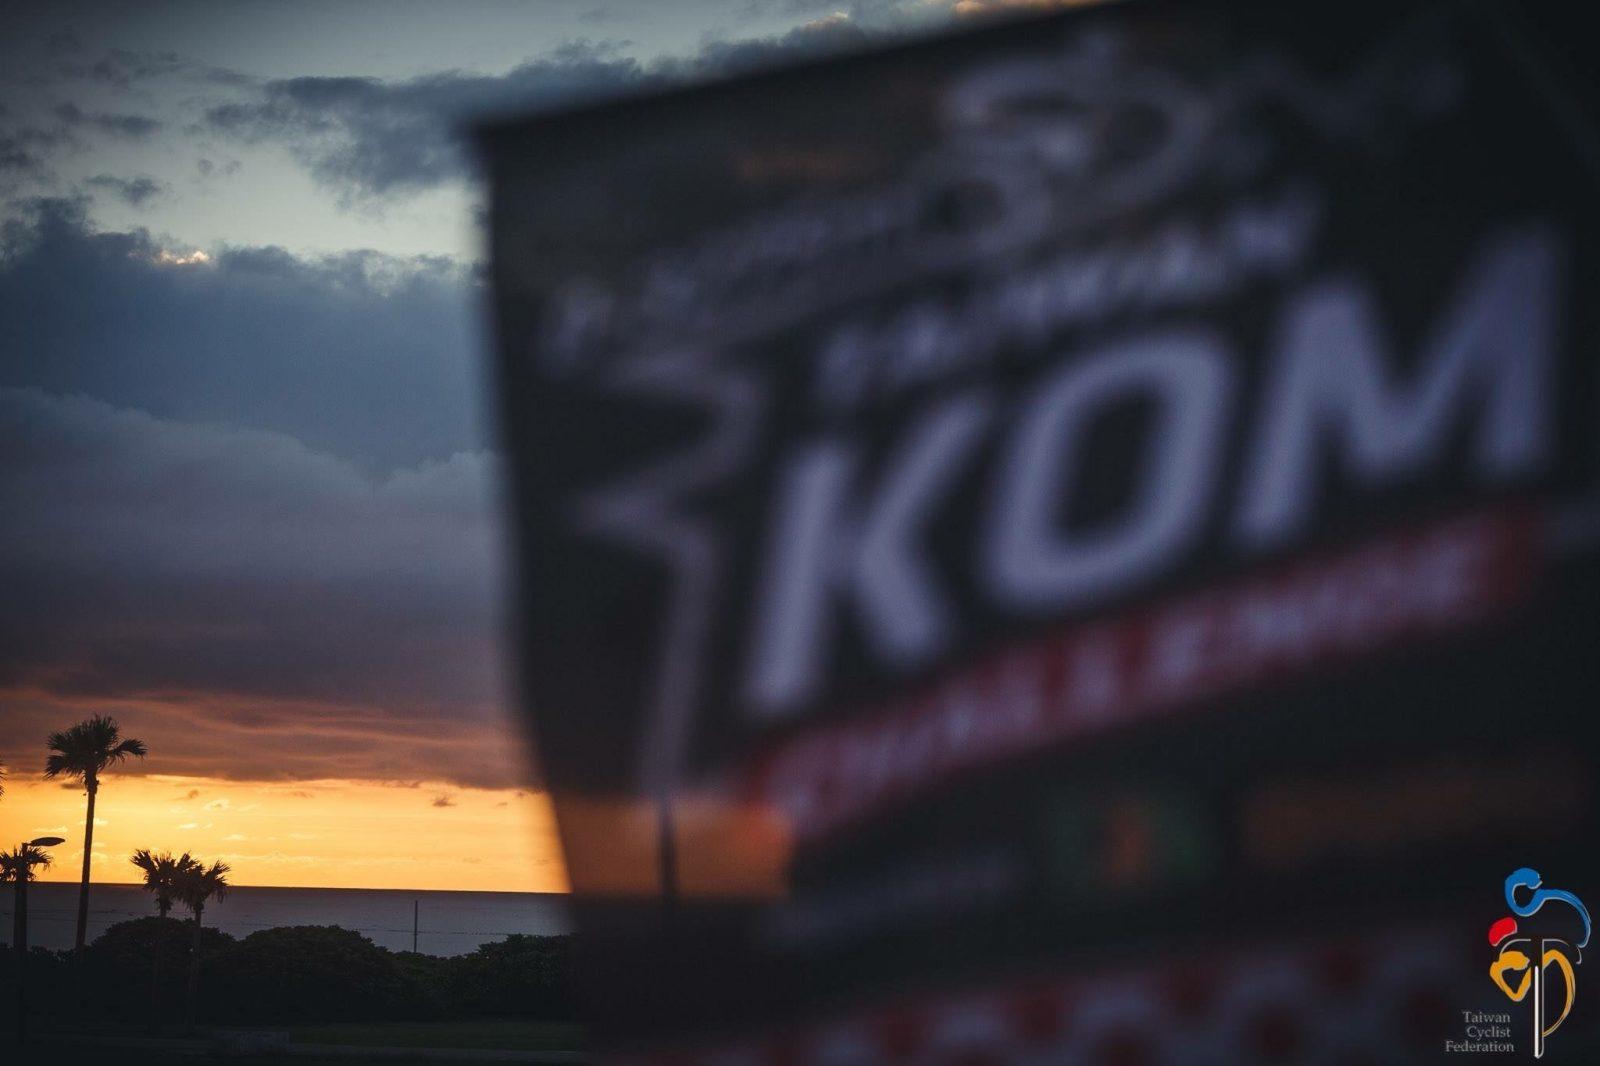 Insider: Taiwan KOM Challenge, The Details